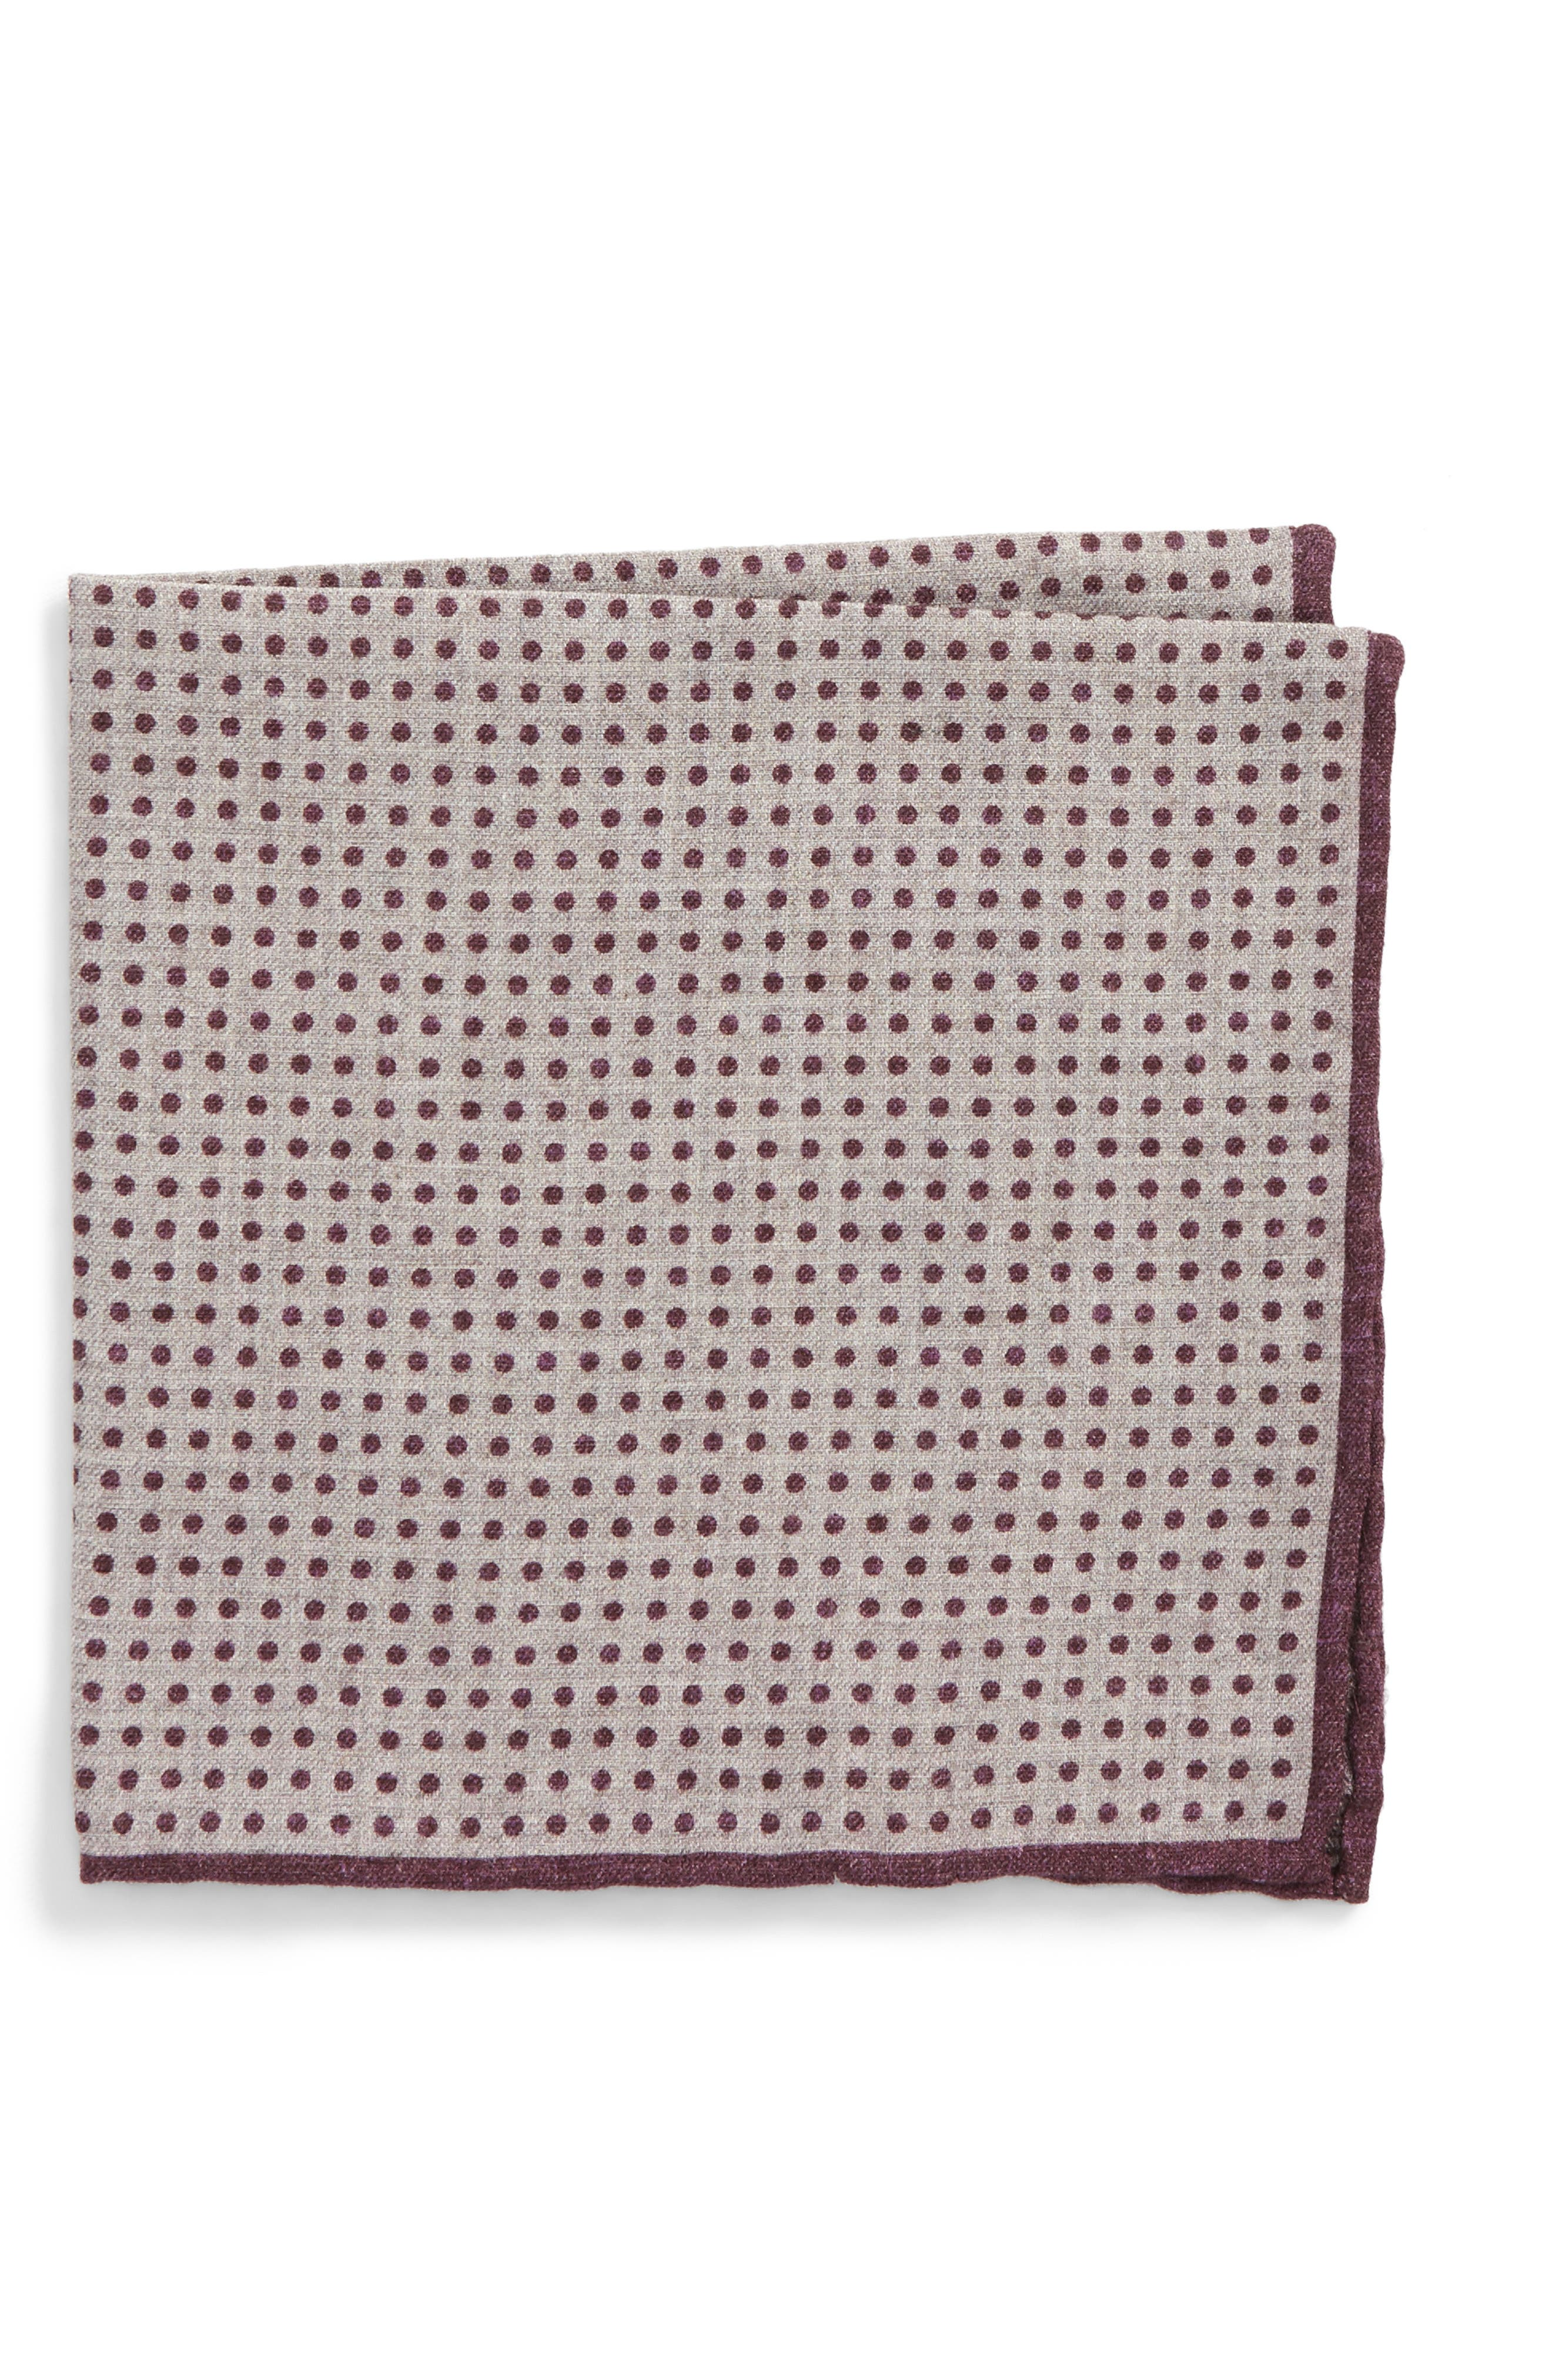 Alternate Image 1 Selected - Eleventy Dot Wool & Cotton Pocket Square